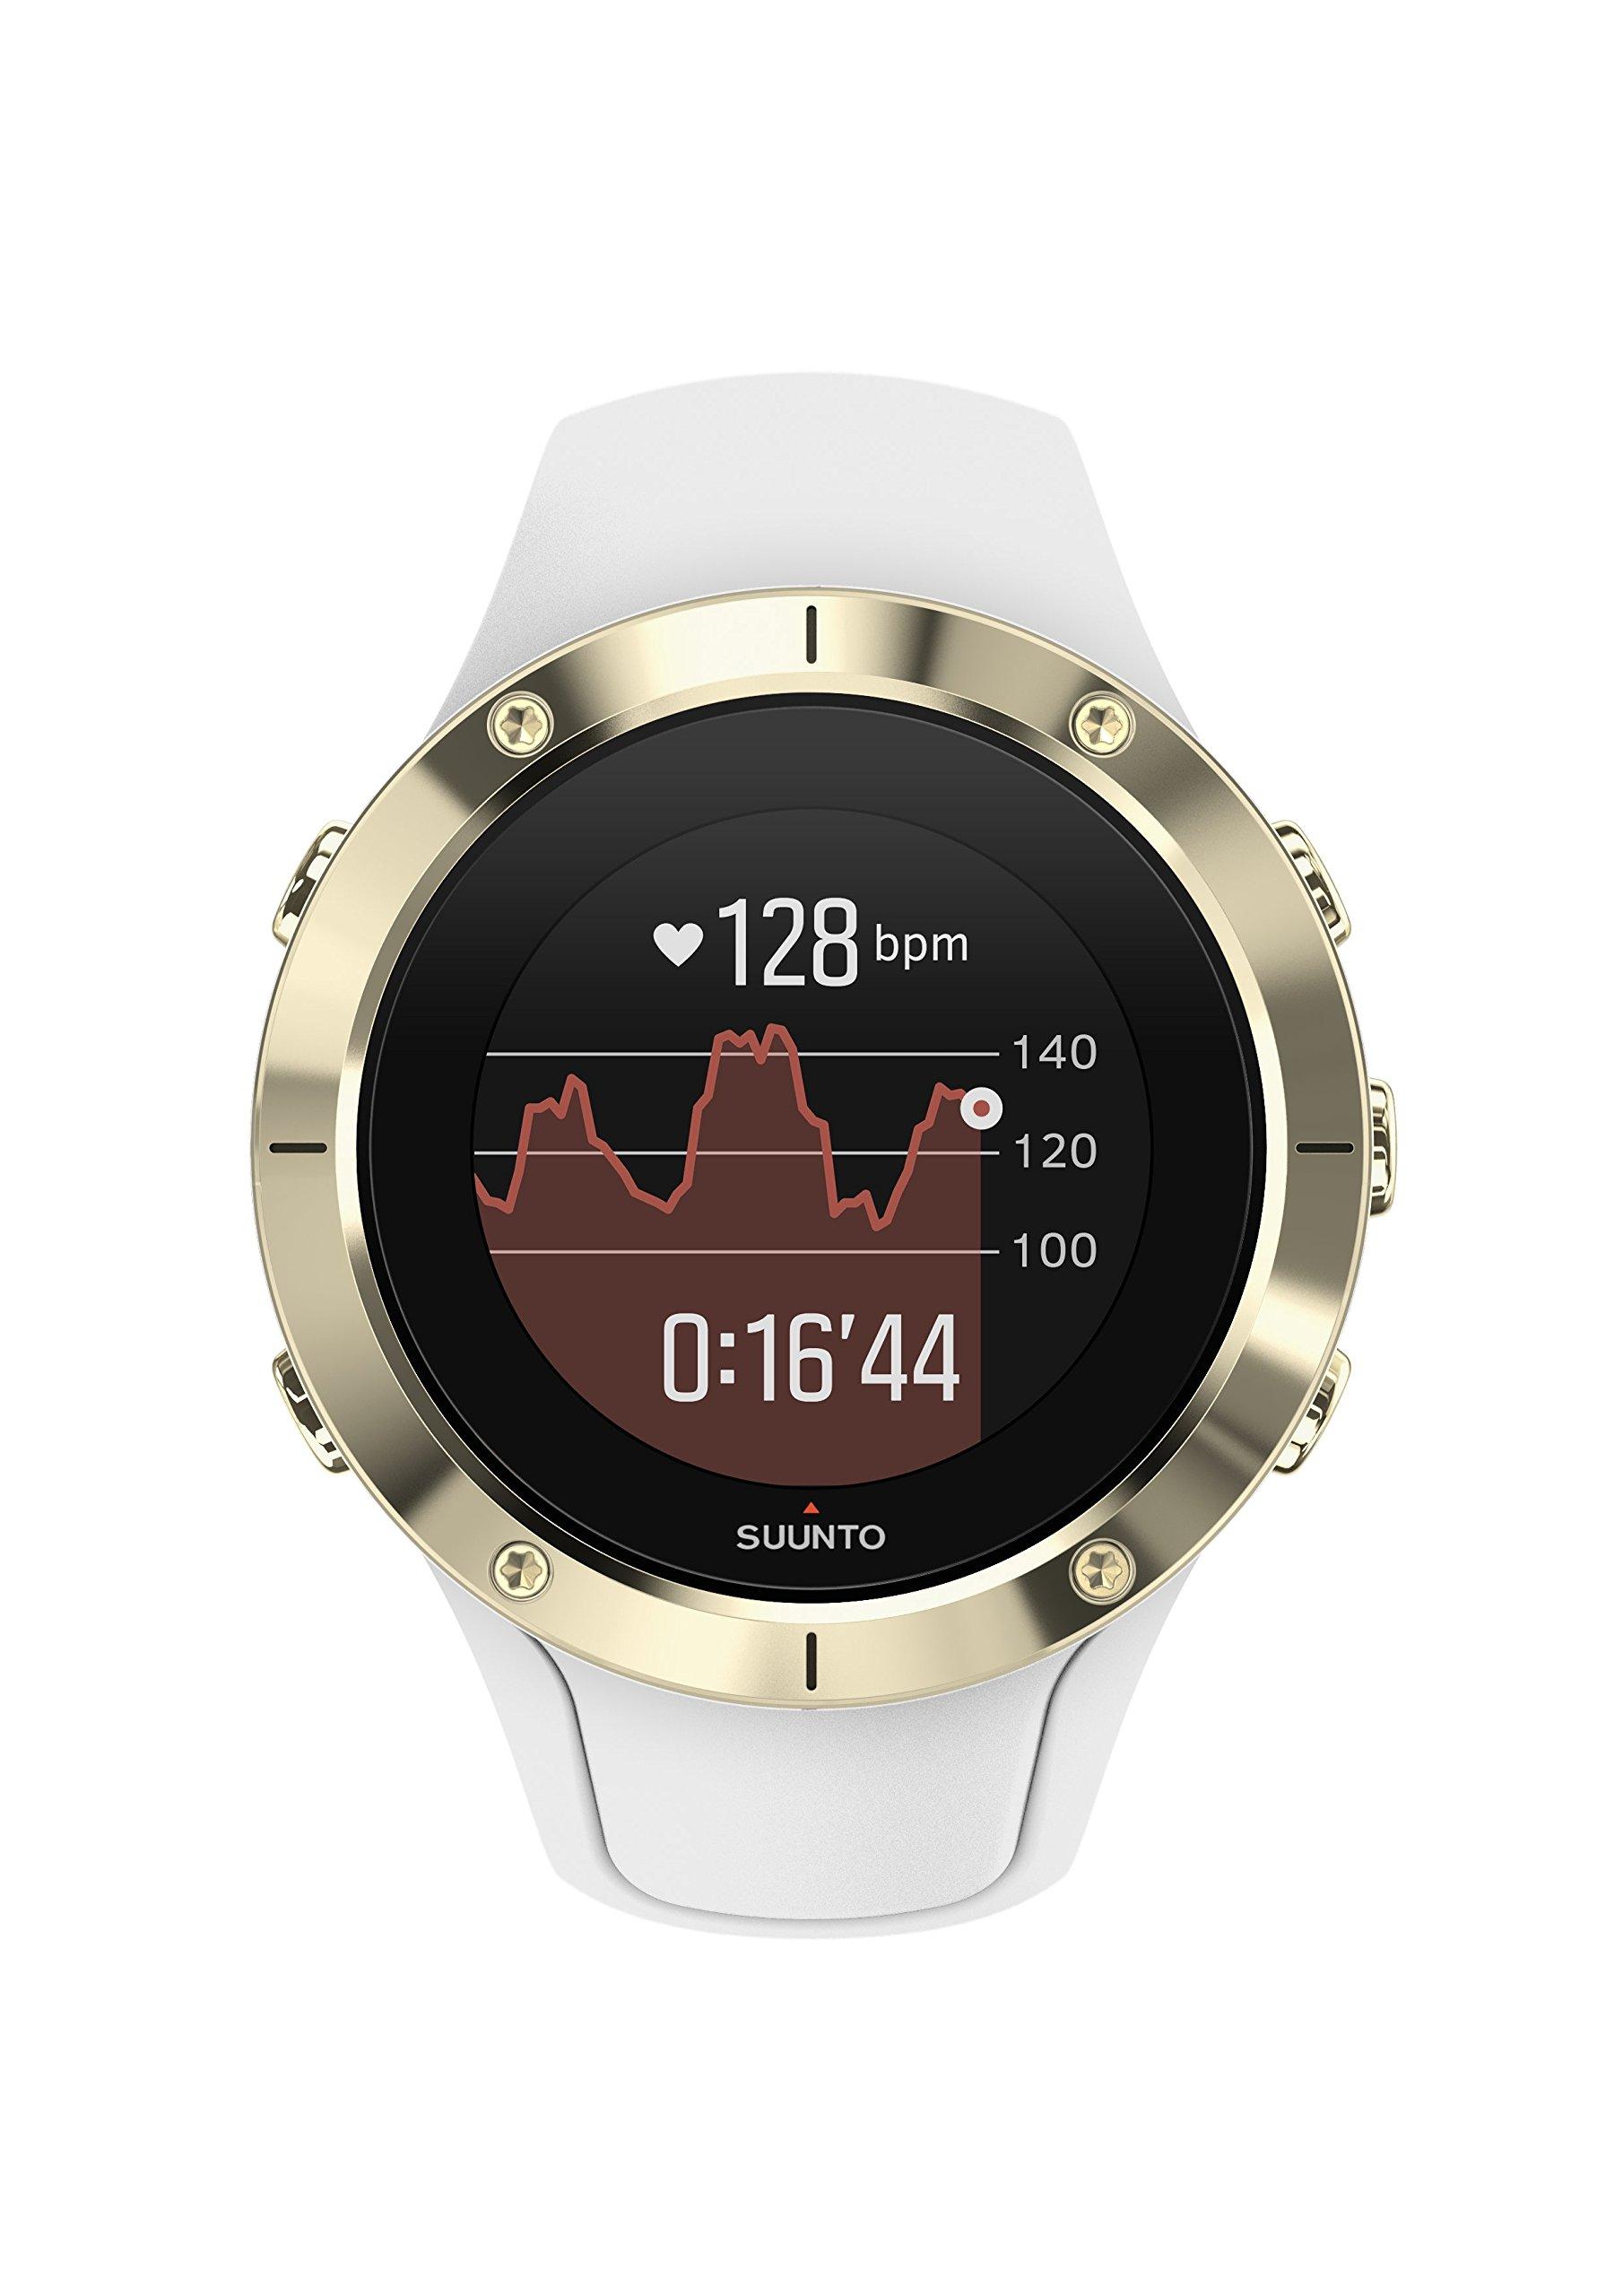 Suunto Spartan Trainer Wrist HR Multisport GPS Watch (Gold) by Suunto (Image #4)